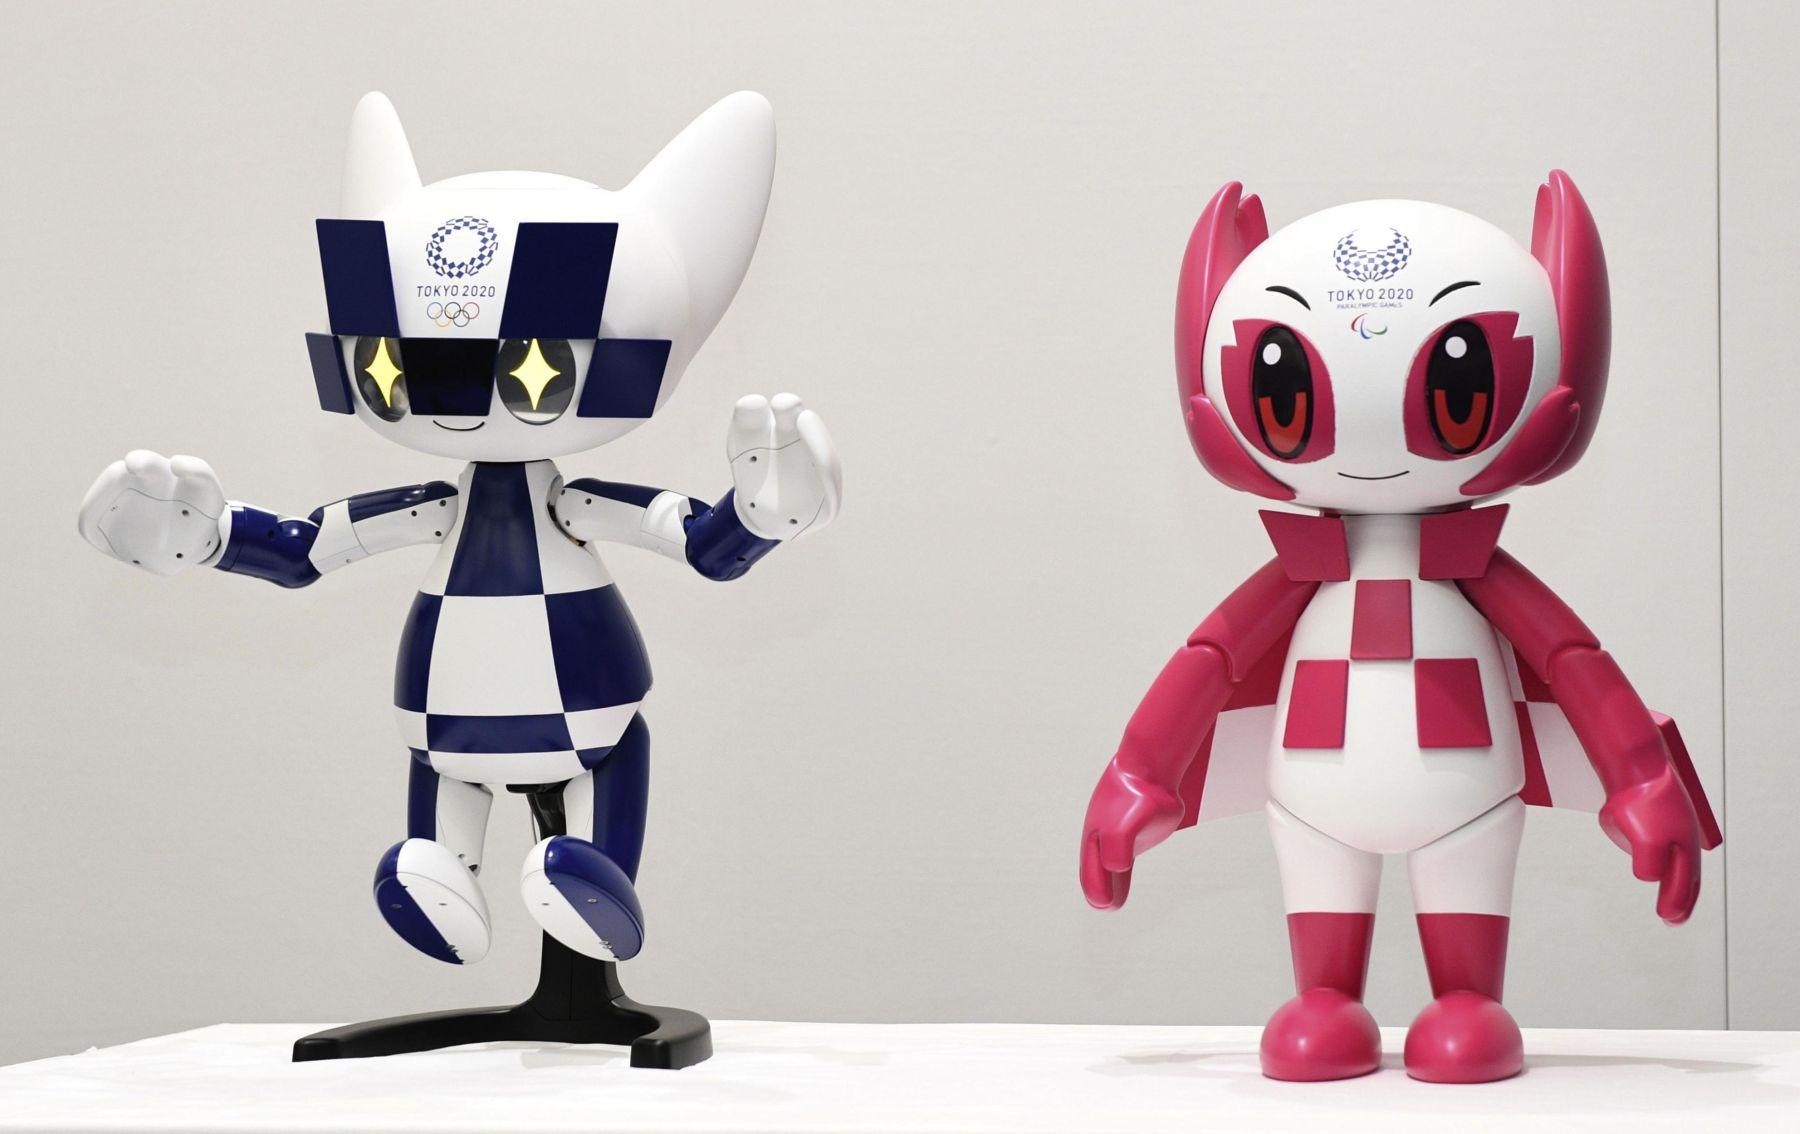 Japan Toyota 2020 Tokyo Olympics Robots 004